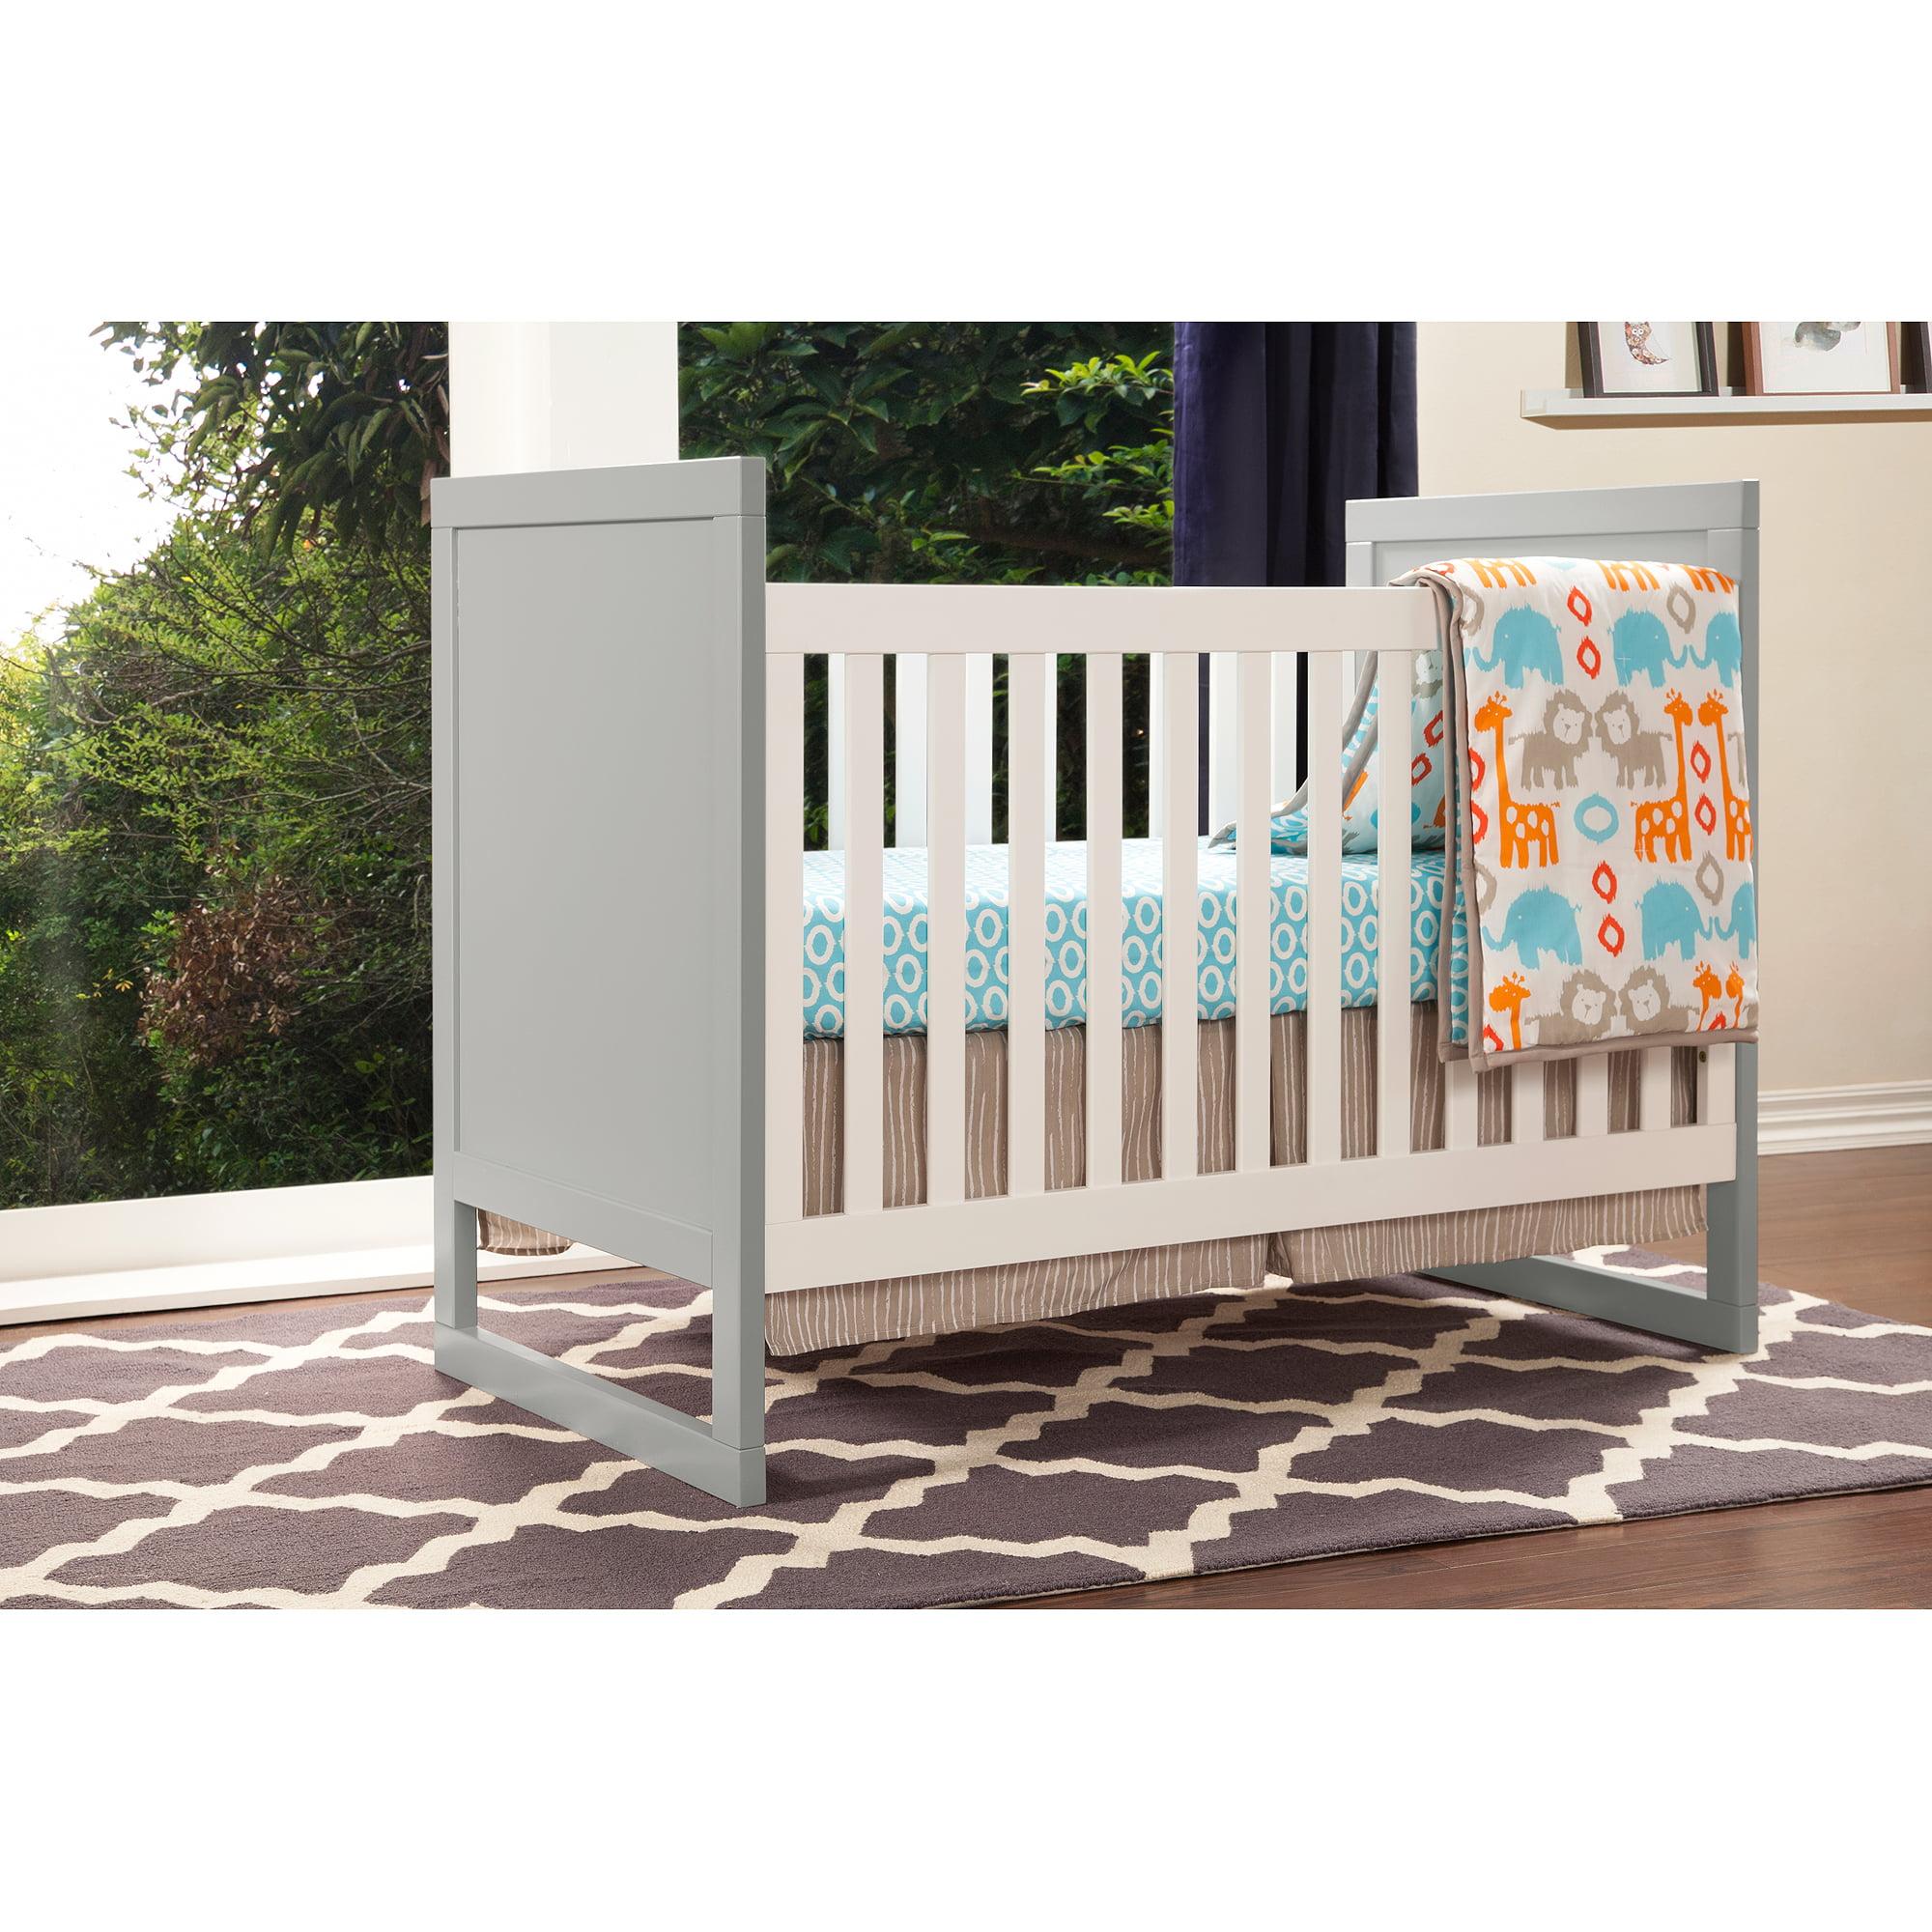 Sumersault - Ikat Animals 4pc Crib Bedding Set